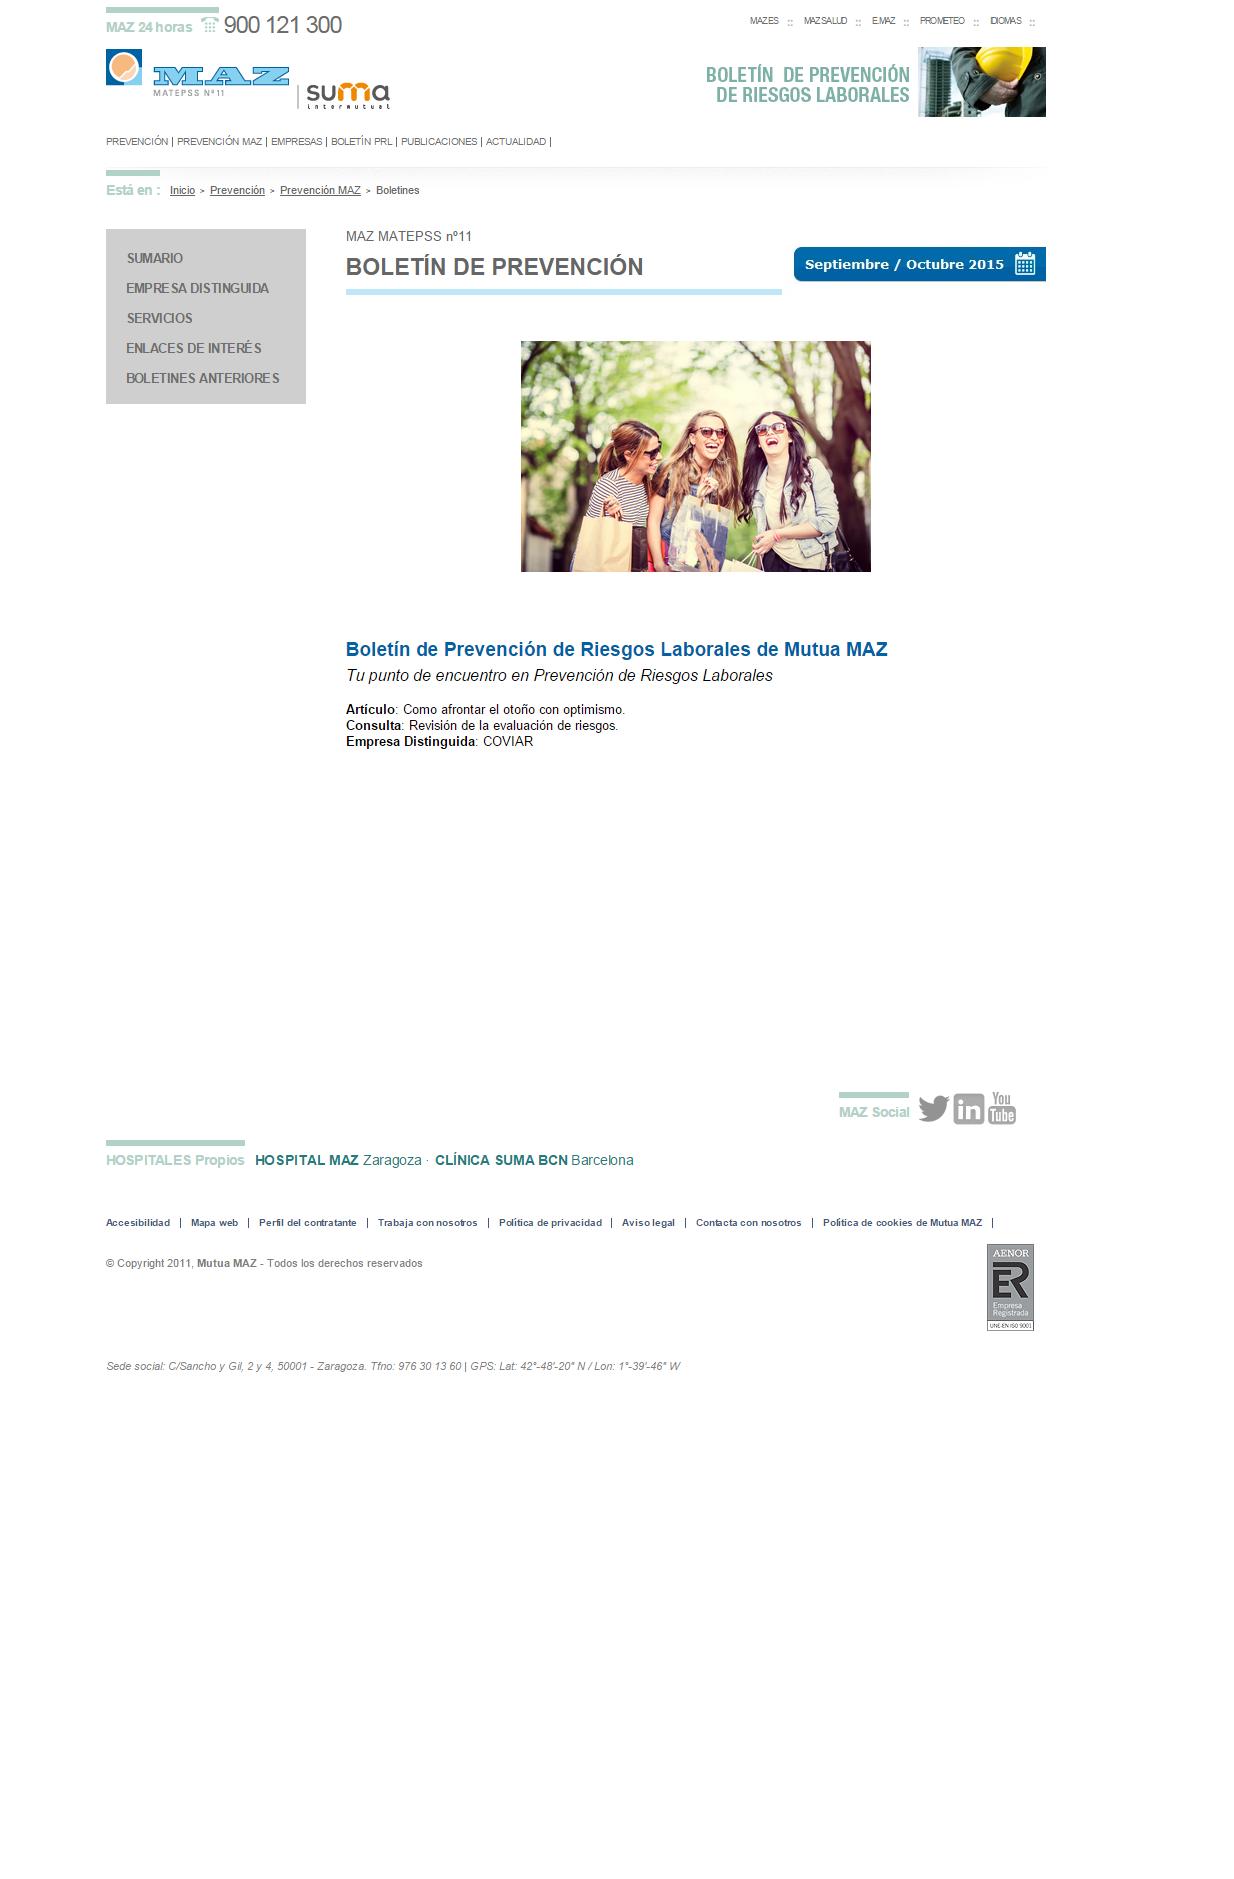 Boletin PRL - Nº 28 - Septiembre 2015